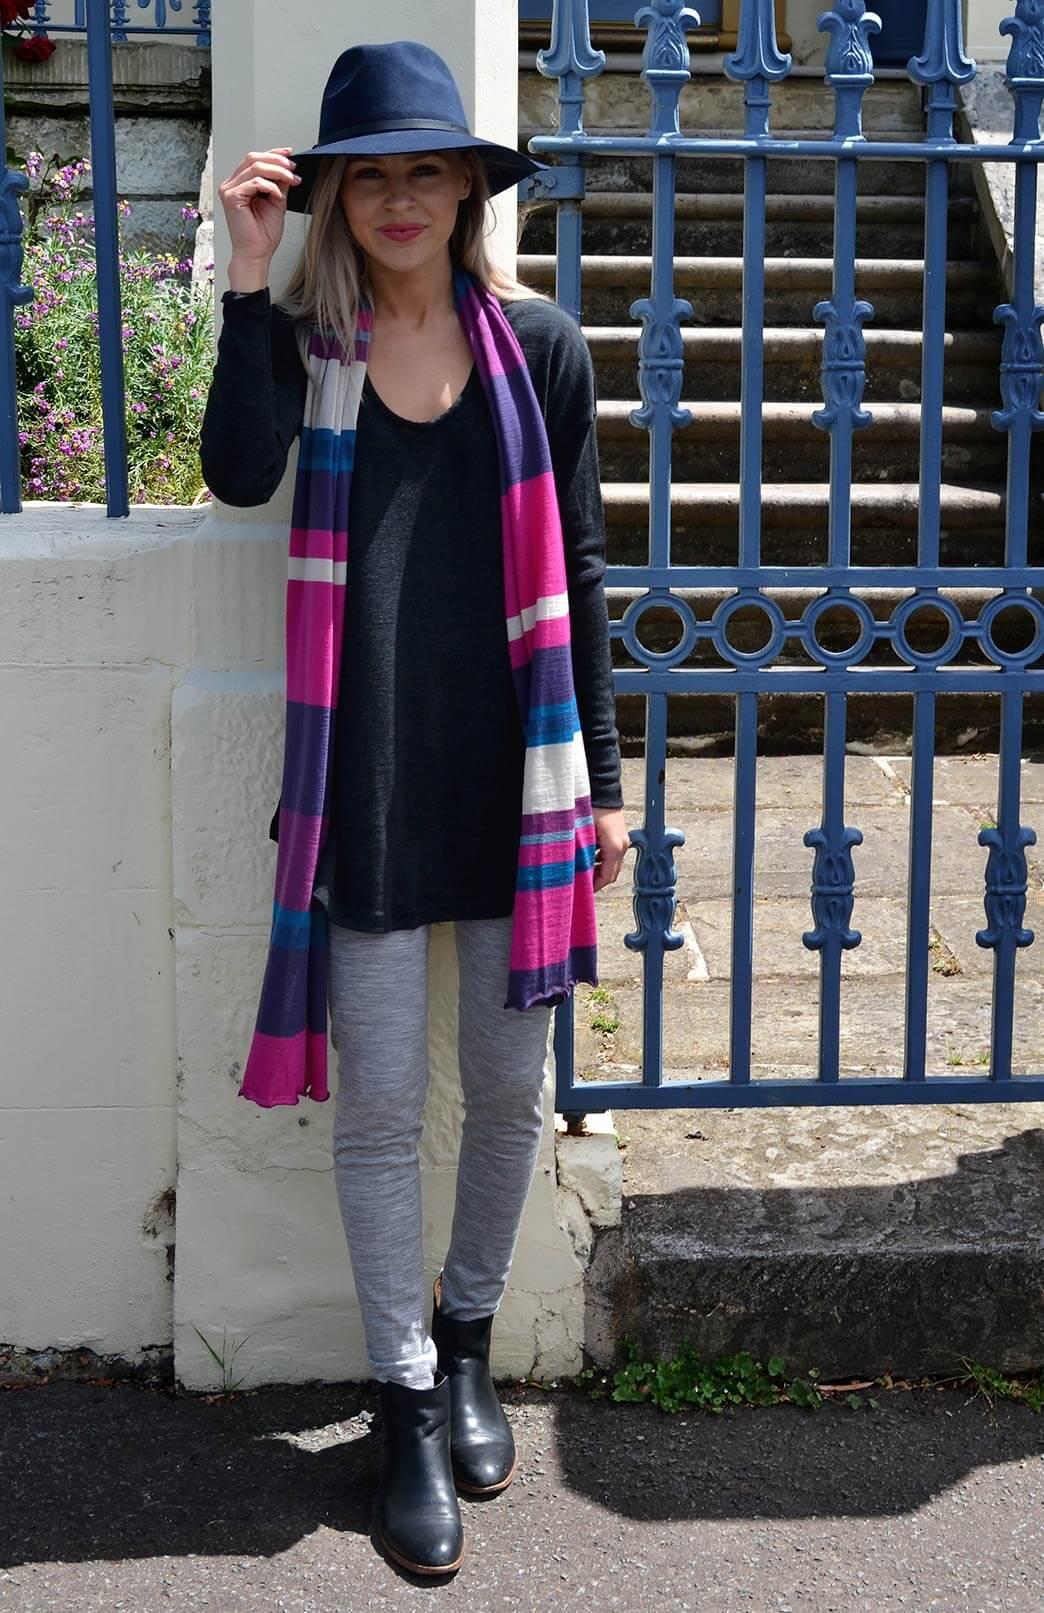 Wave Top - Women's Dark Grey Charcoal Wool Long Sleeved Top with dropped shoulder - Smitten Merino Tasmania Australia